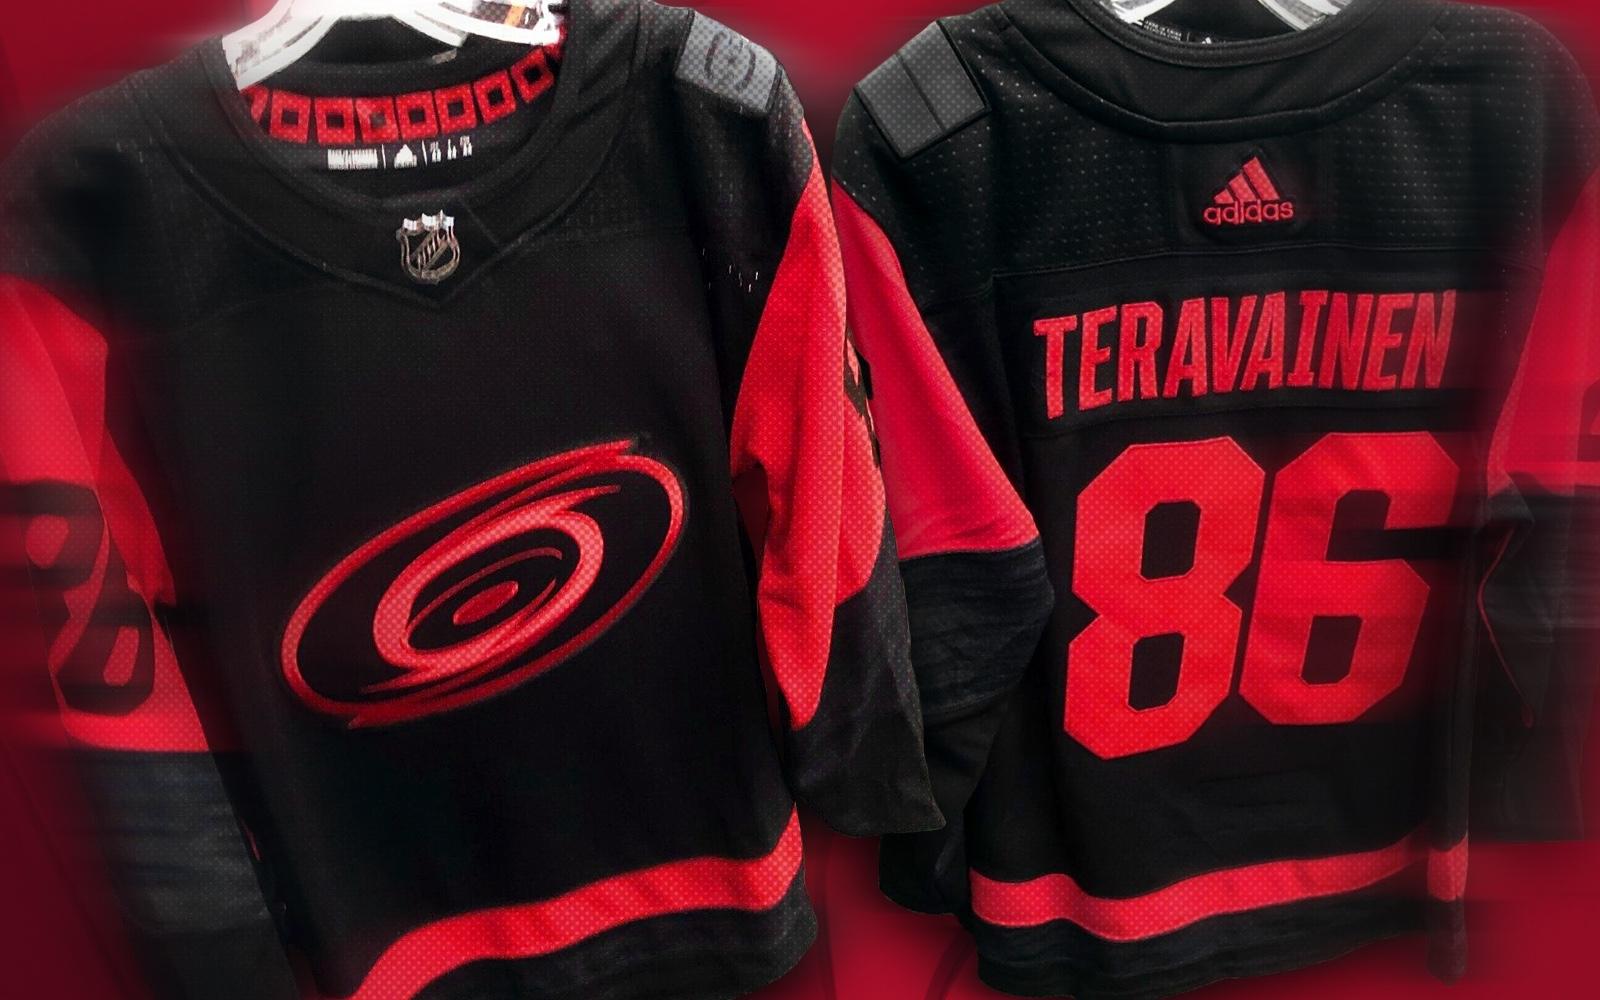 Leak reveals Stadium Series jersey for Hurricanes